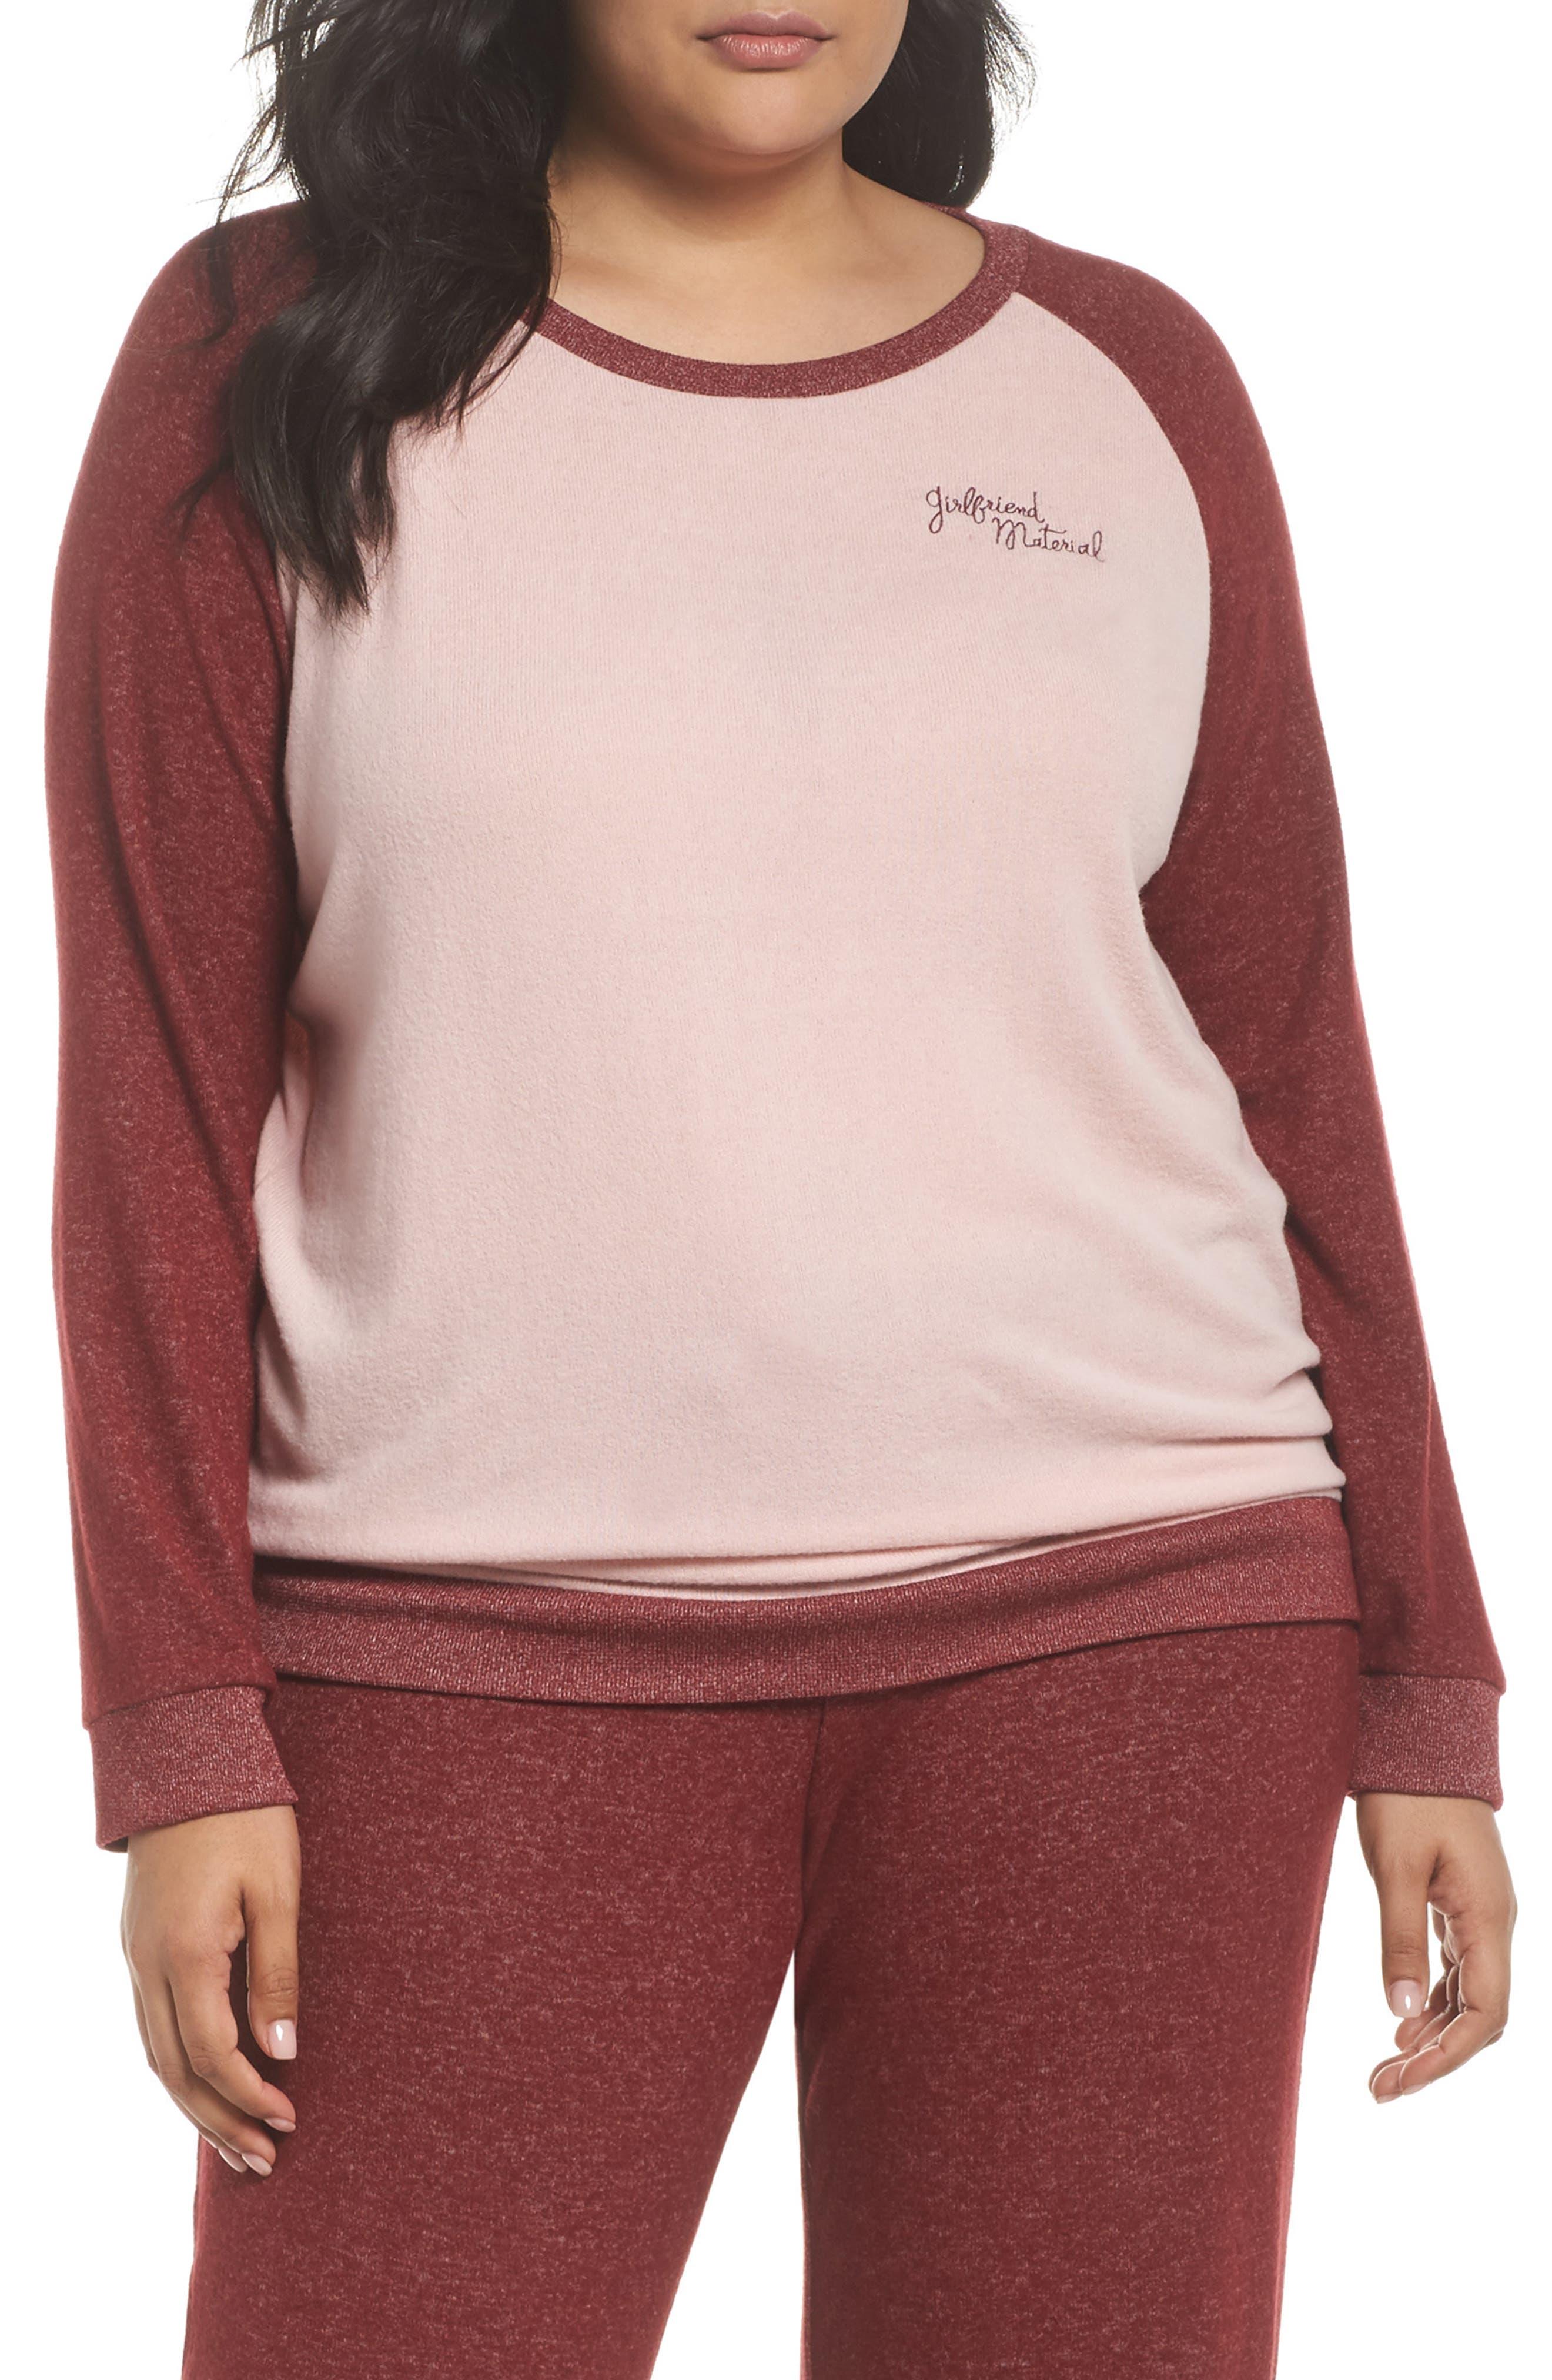 Alternate Image 1 Selected - Make + Model Cozy Crew Lounge Sweater (Plus Size)